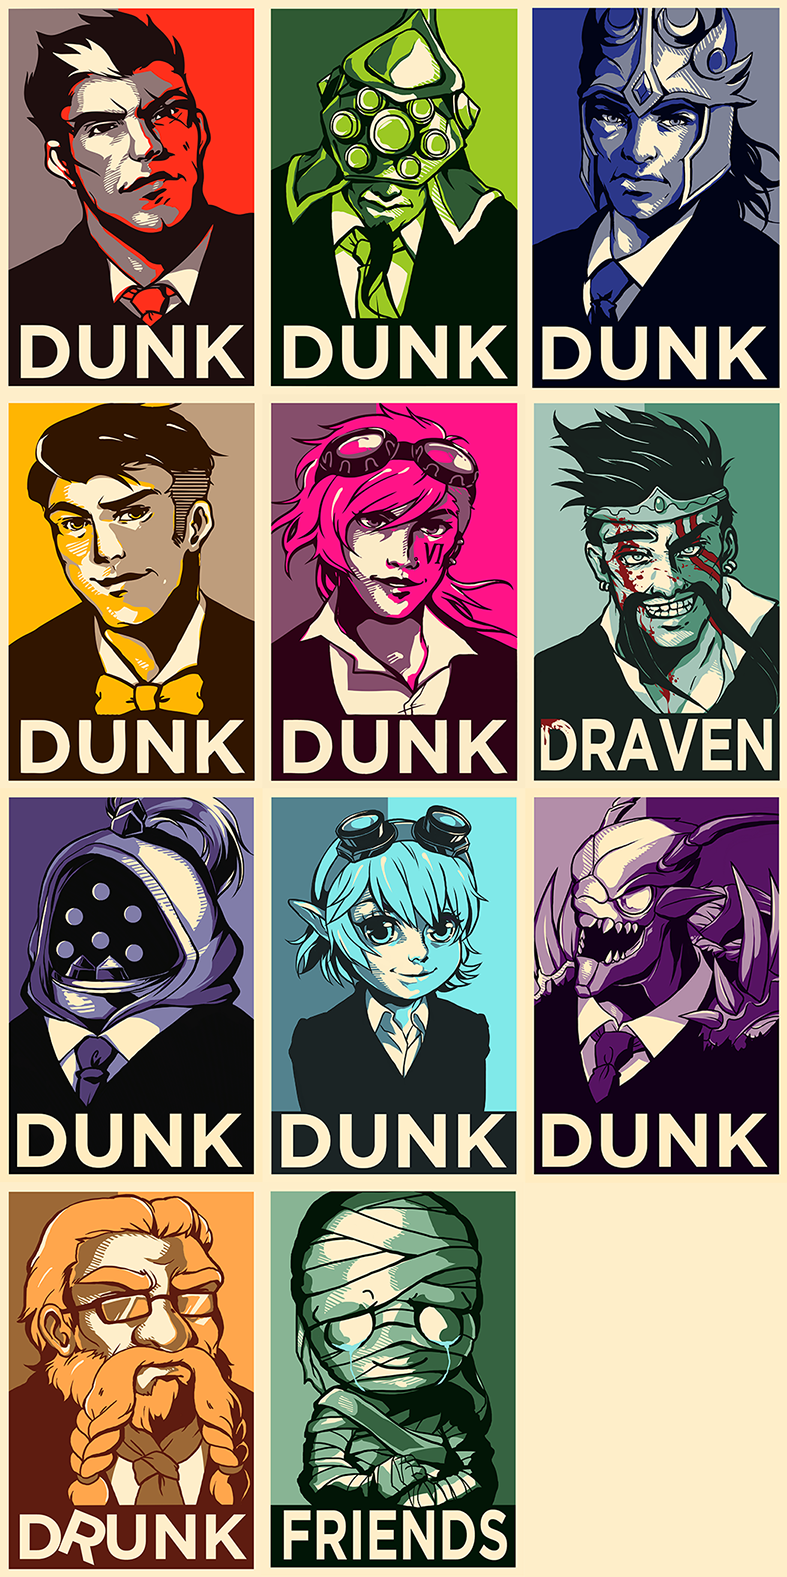 dunk quilt.png